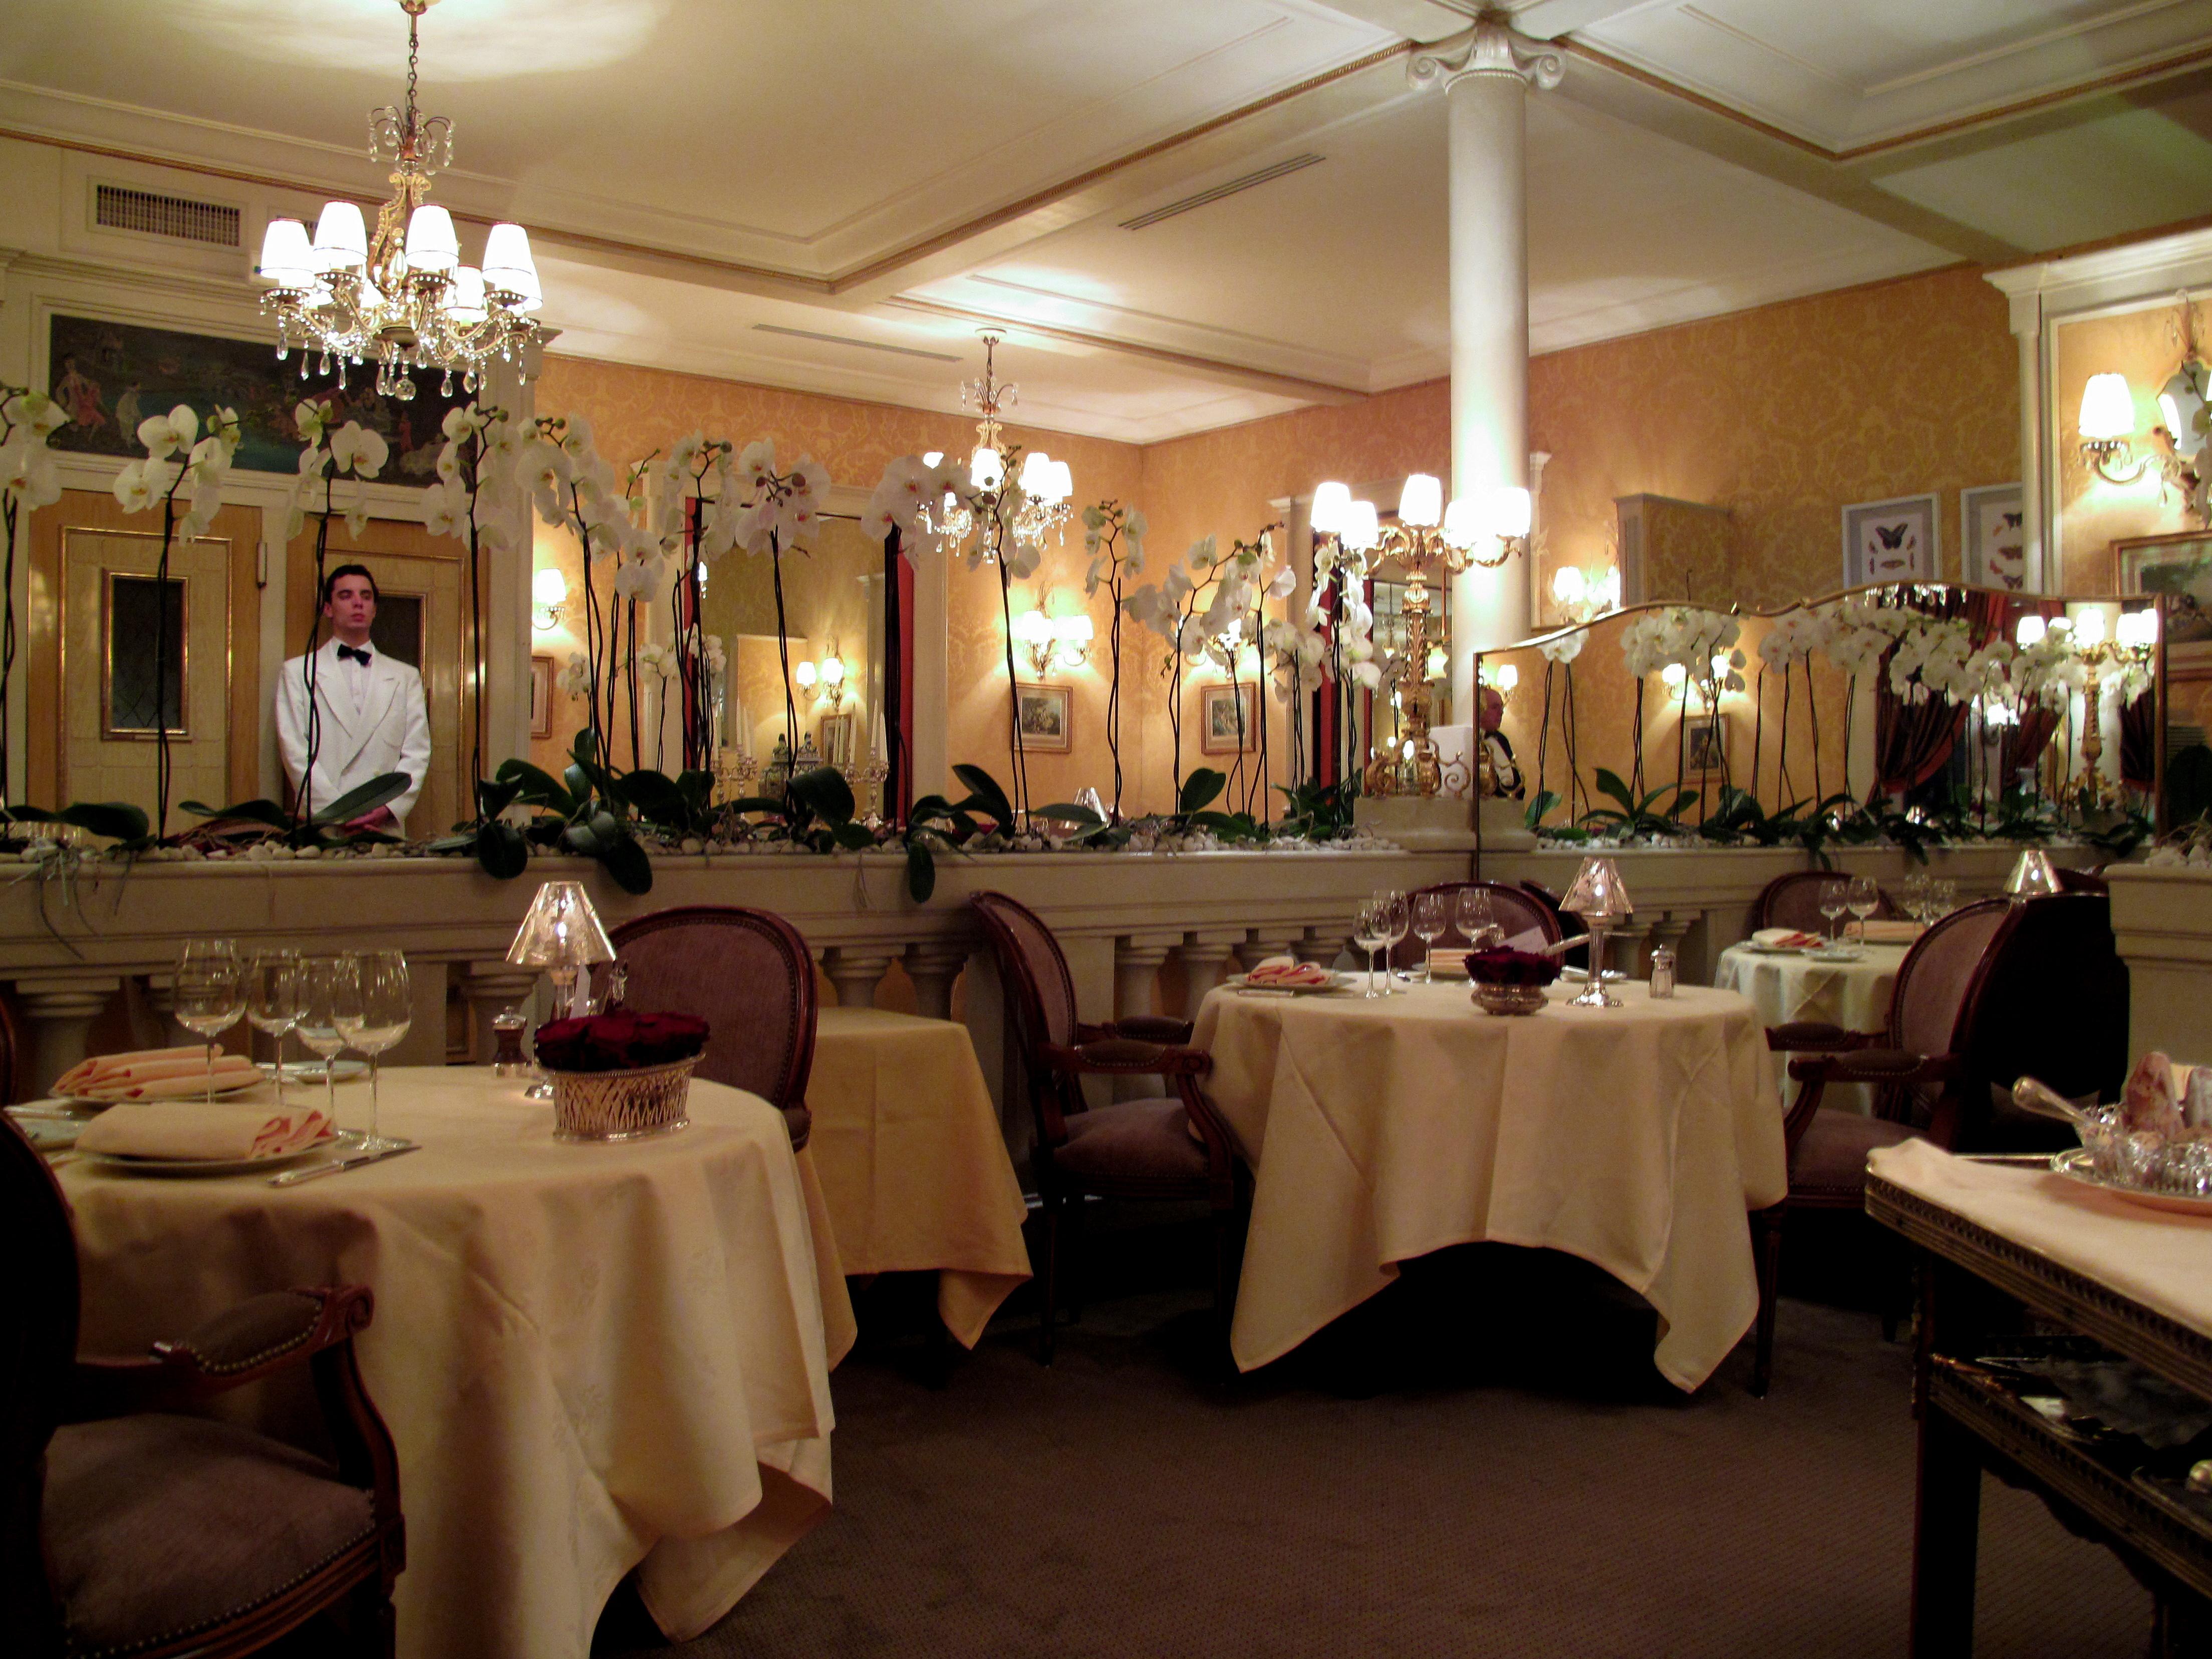 Restaurant A Salers St Criclapopie